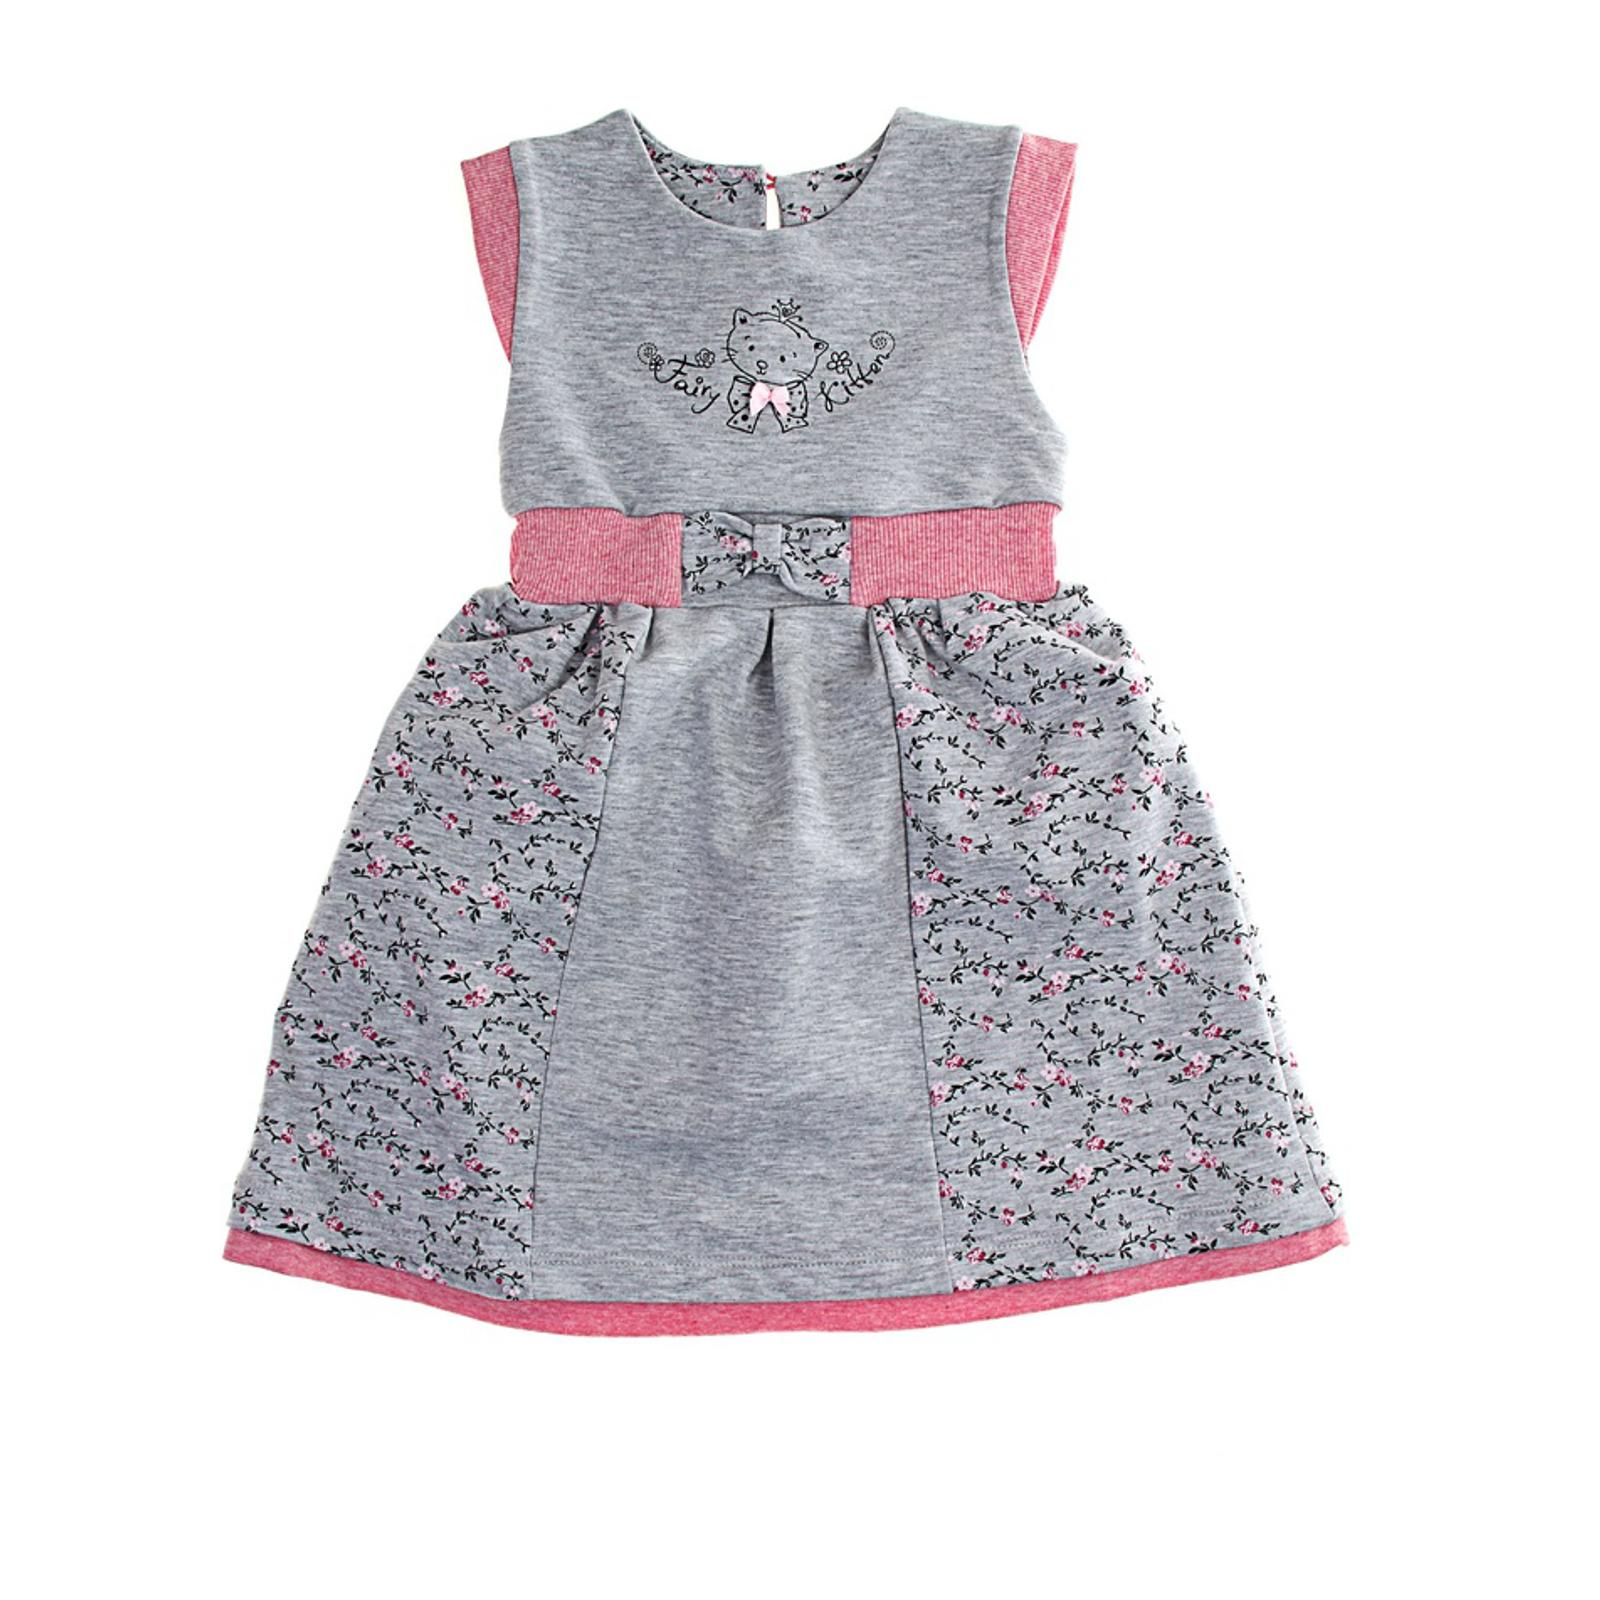 Сарафан Soni Kids Cони Кидс Кошечка Фея, цвет серый размер 98